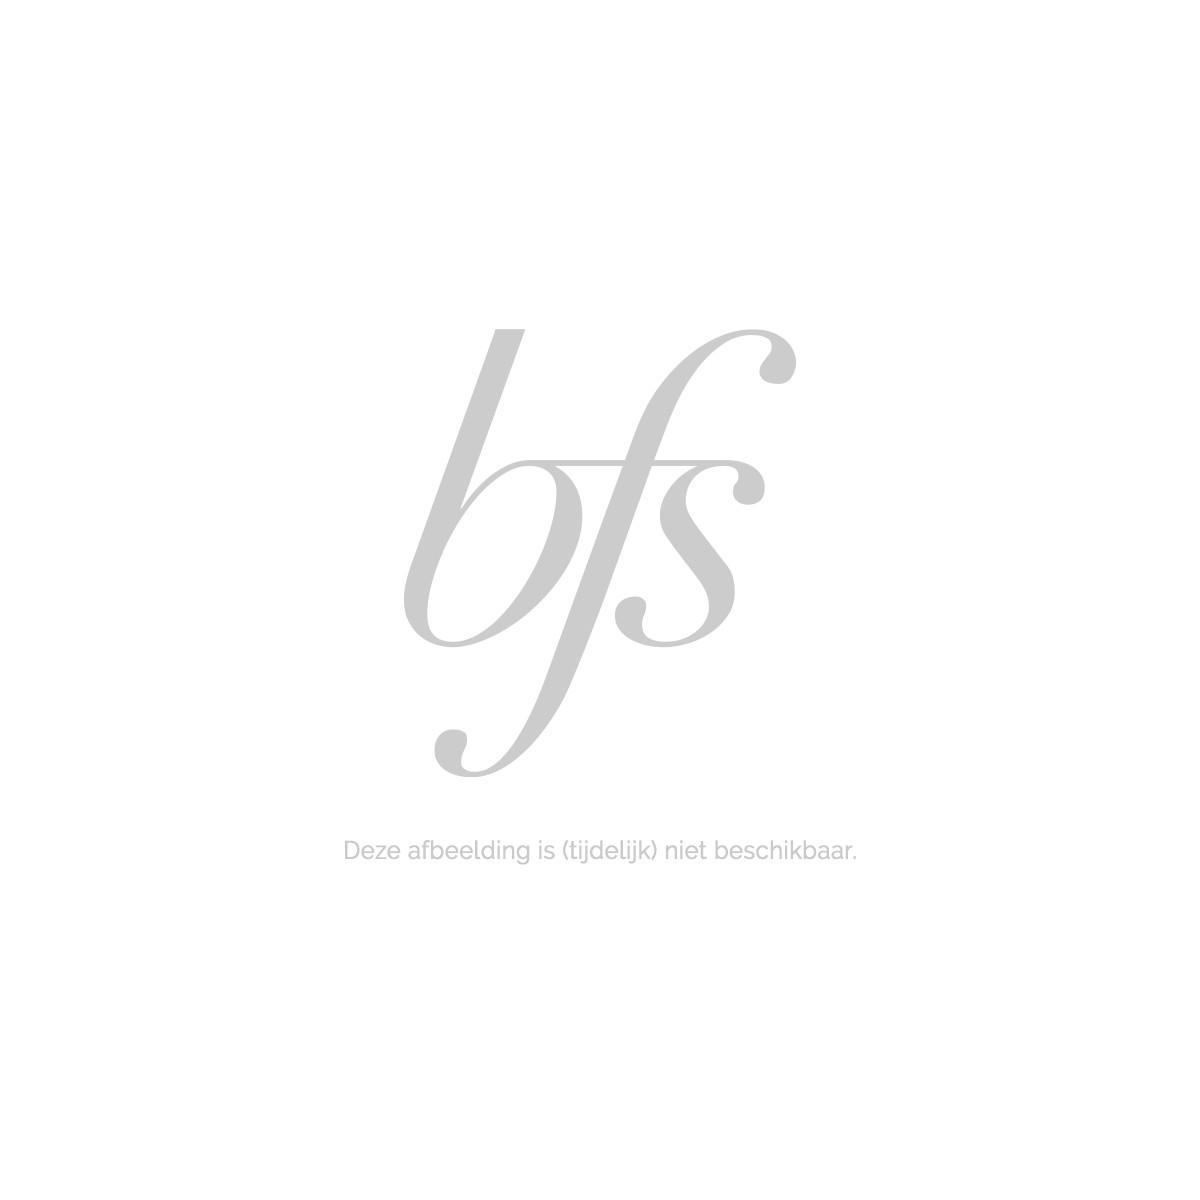 Pupa Smoothing Foundation Primer 04 Rose